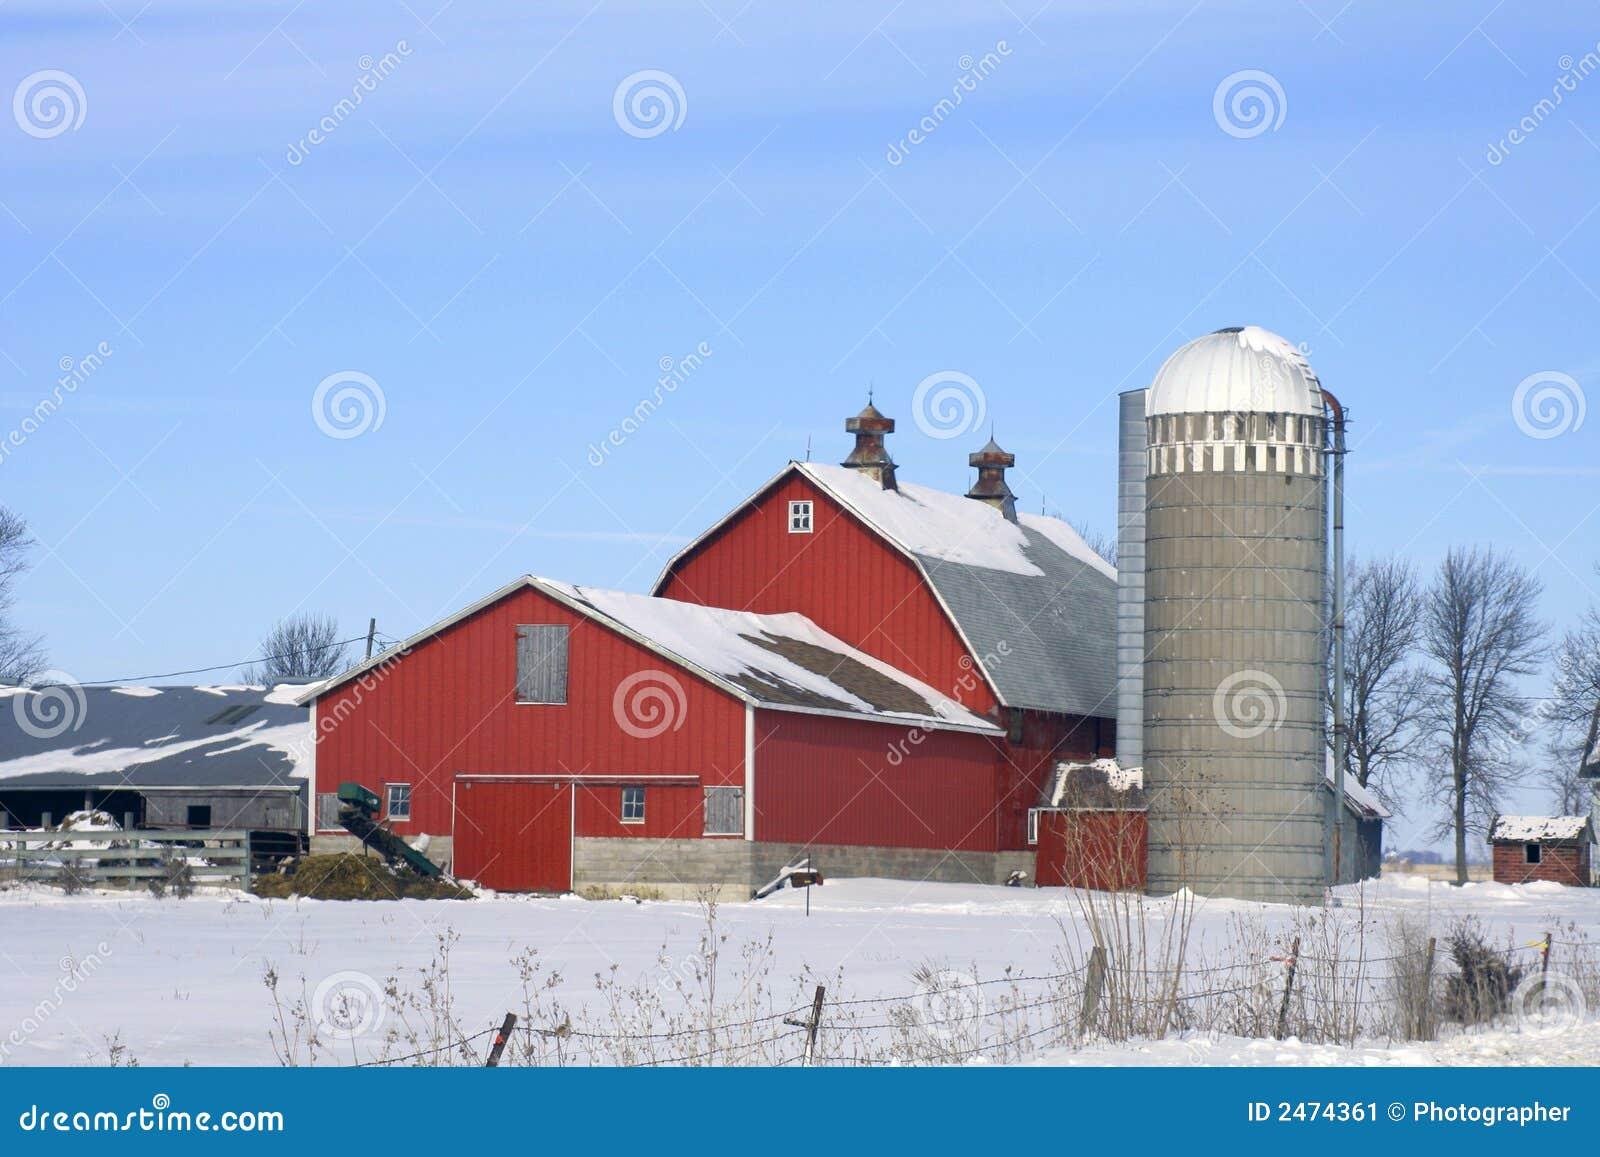 Dairy Farm Winter Stock Image Image Of Winter White